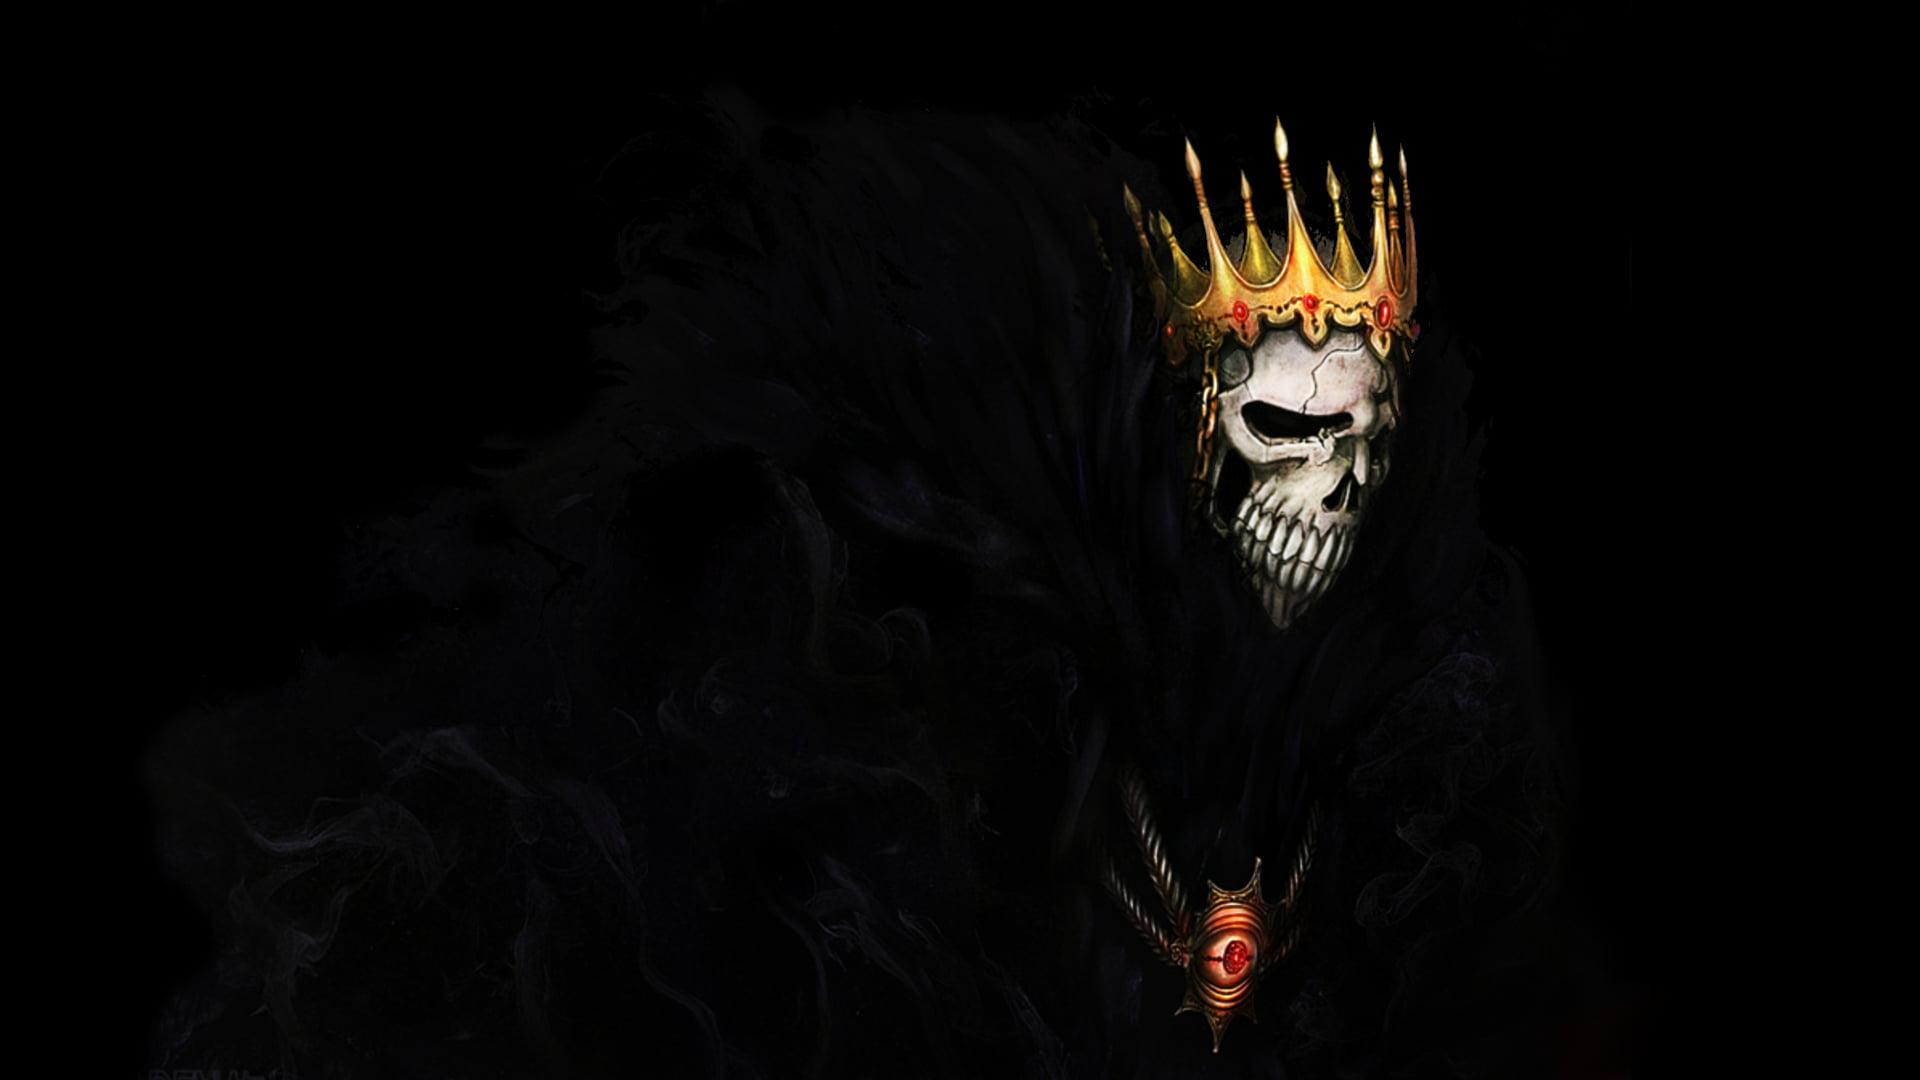 Iphone 2g Wallpaper Digital Art Of Skull Wearing Crown Hd Wallpaper